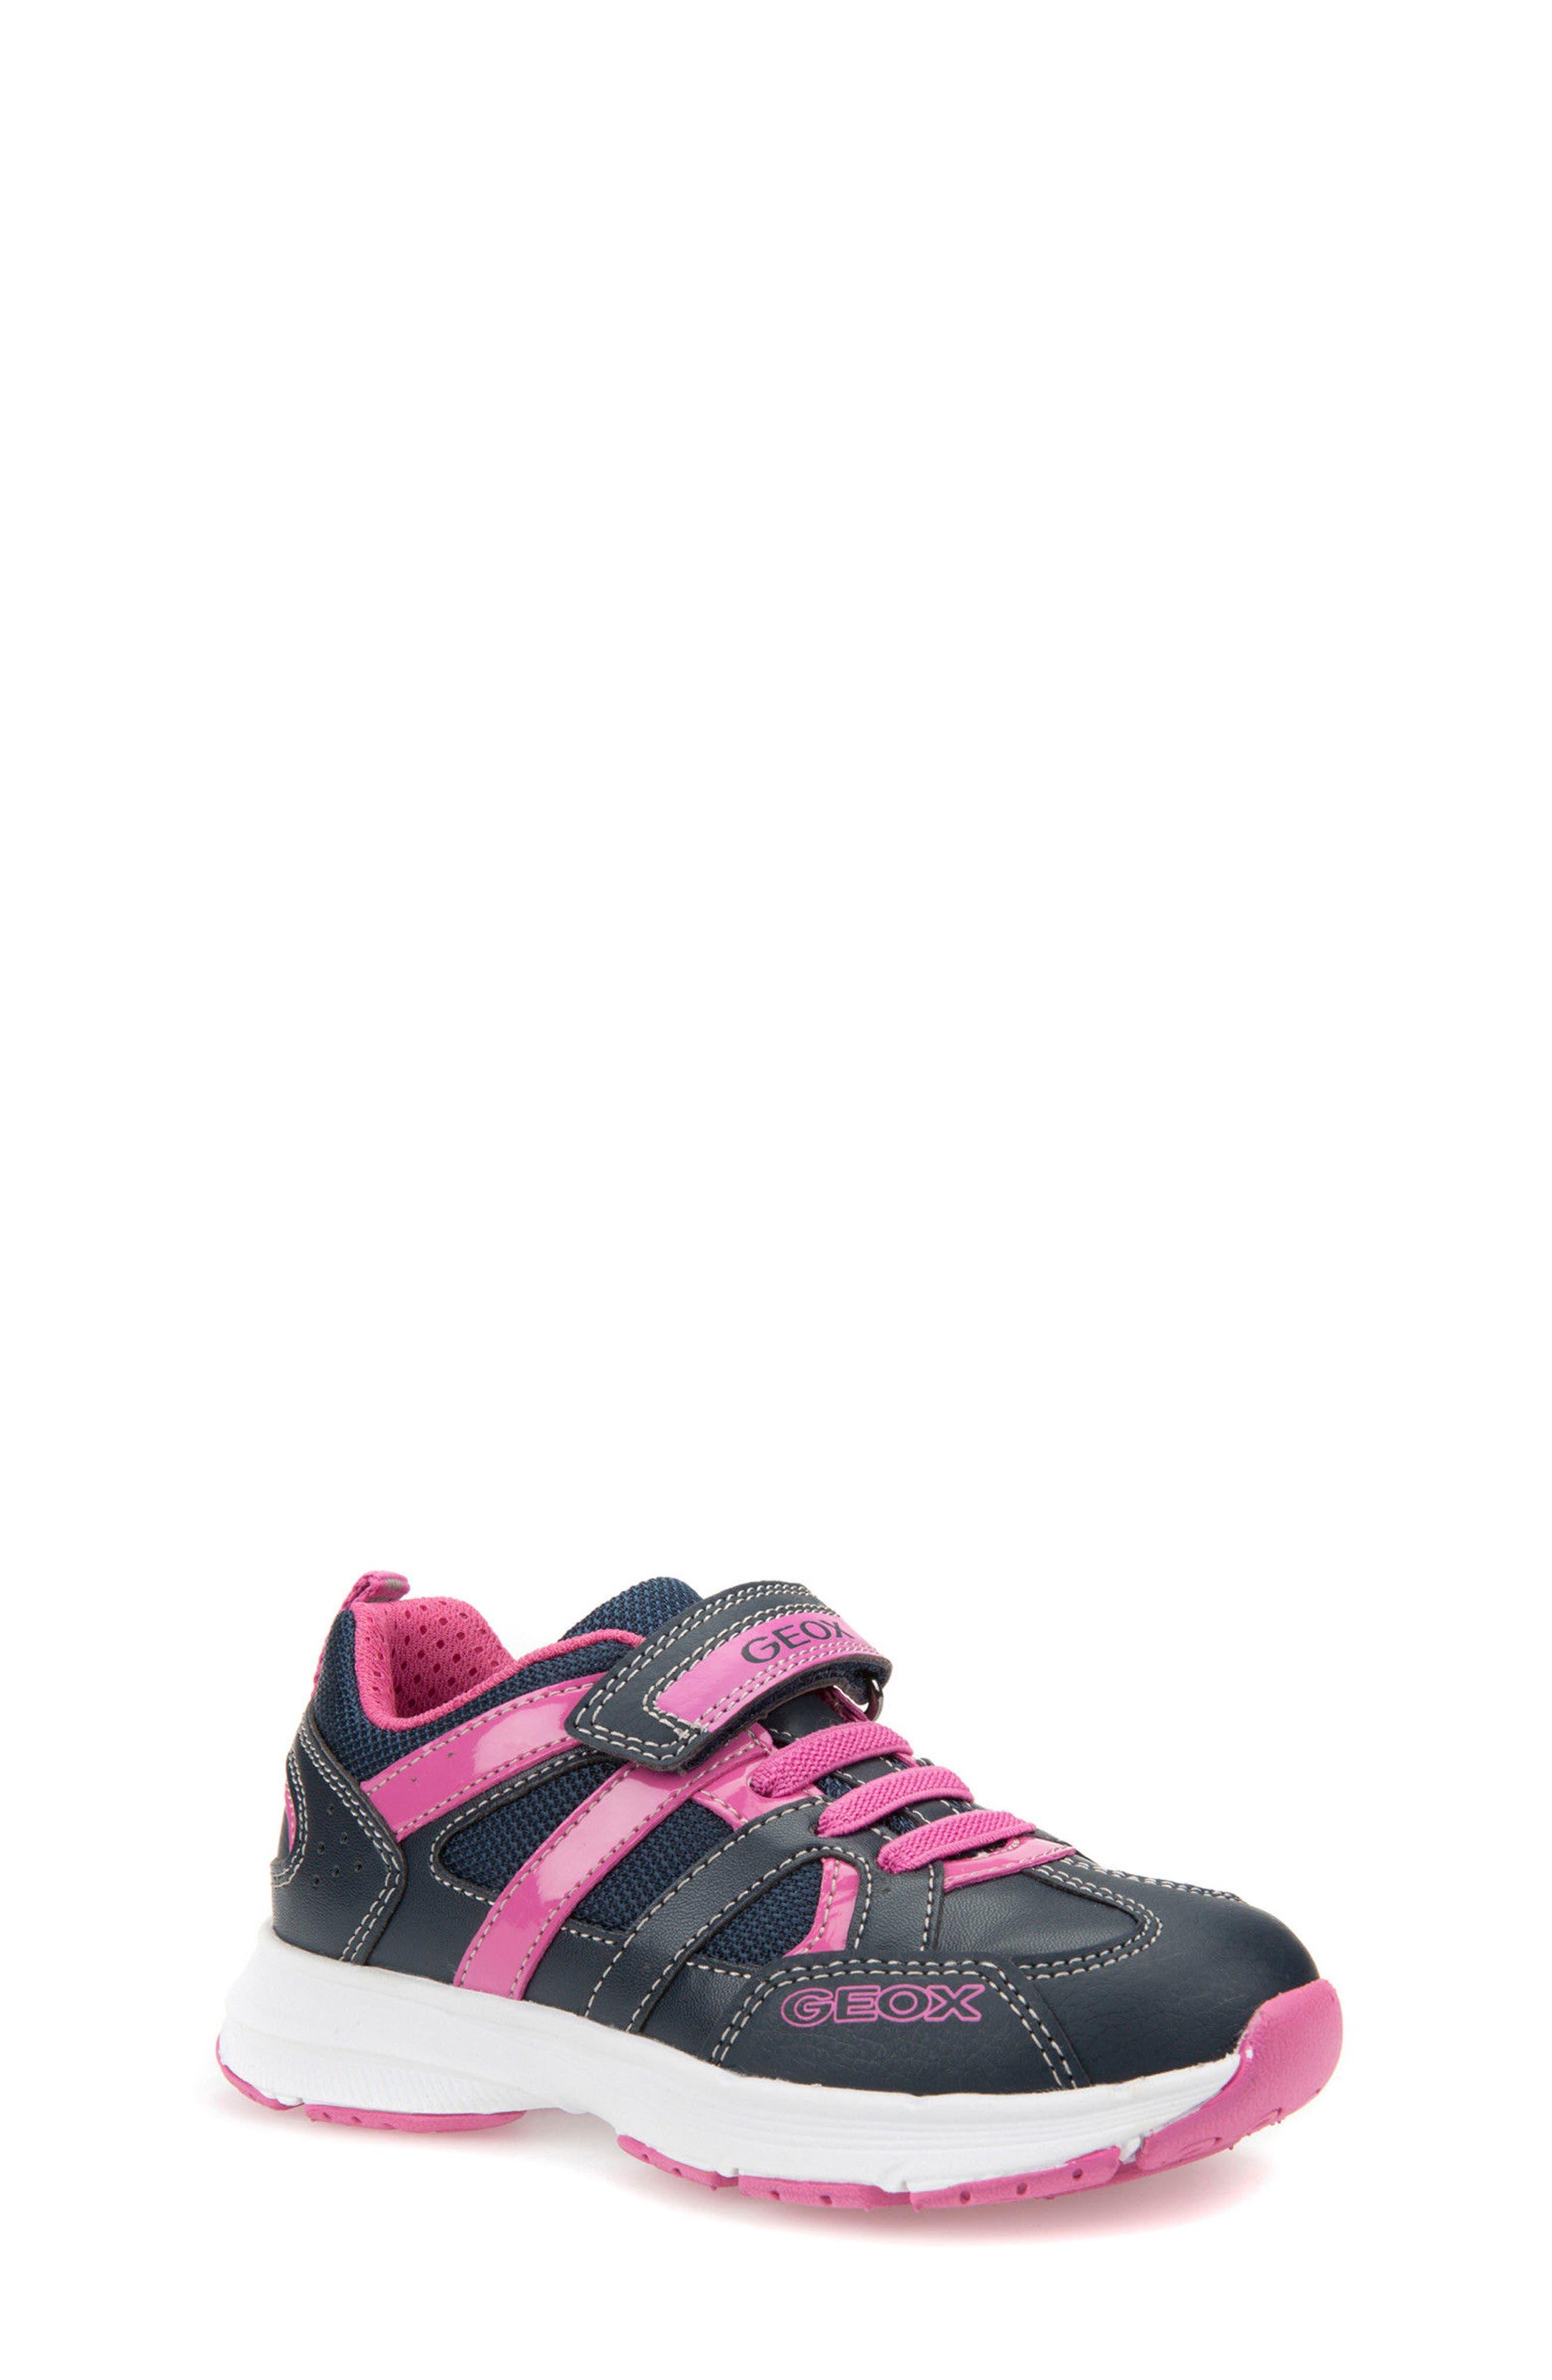 GEOX Top Fly Sneaker